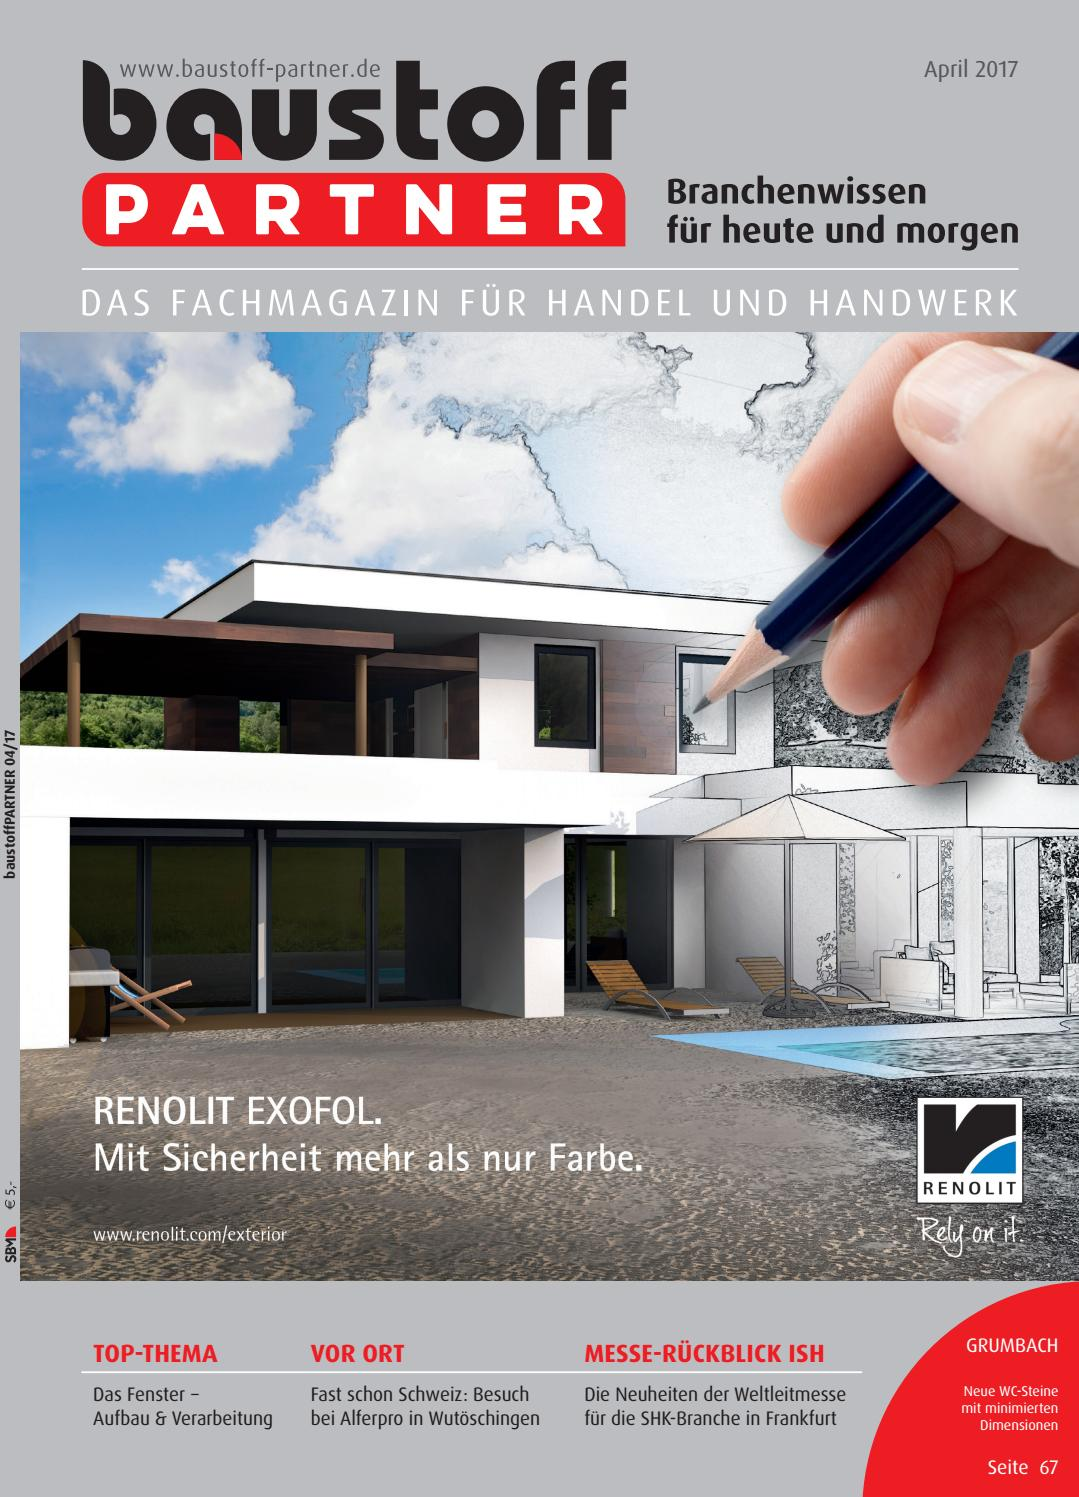 Full Size of Drutex Erfahrungen Forum Fenster Test Wohnzimmer Drutex Erfahrungen Forum